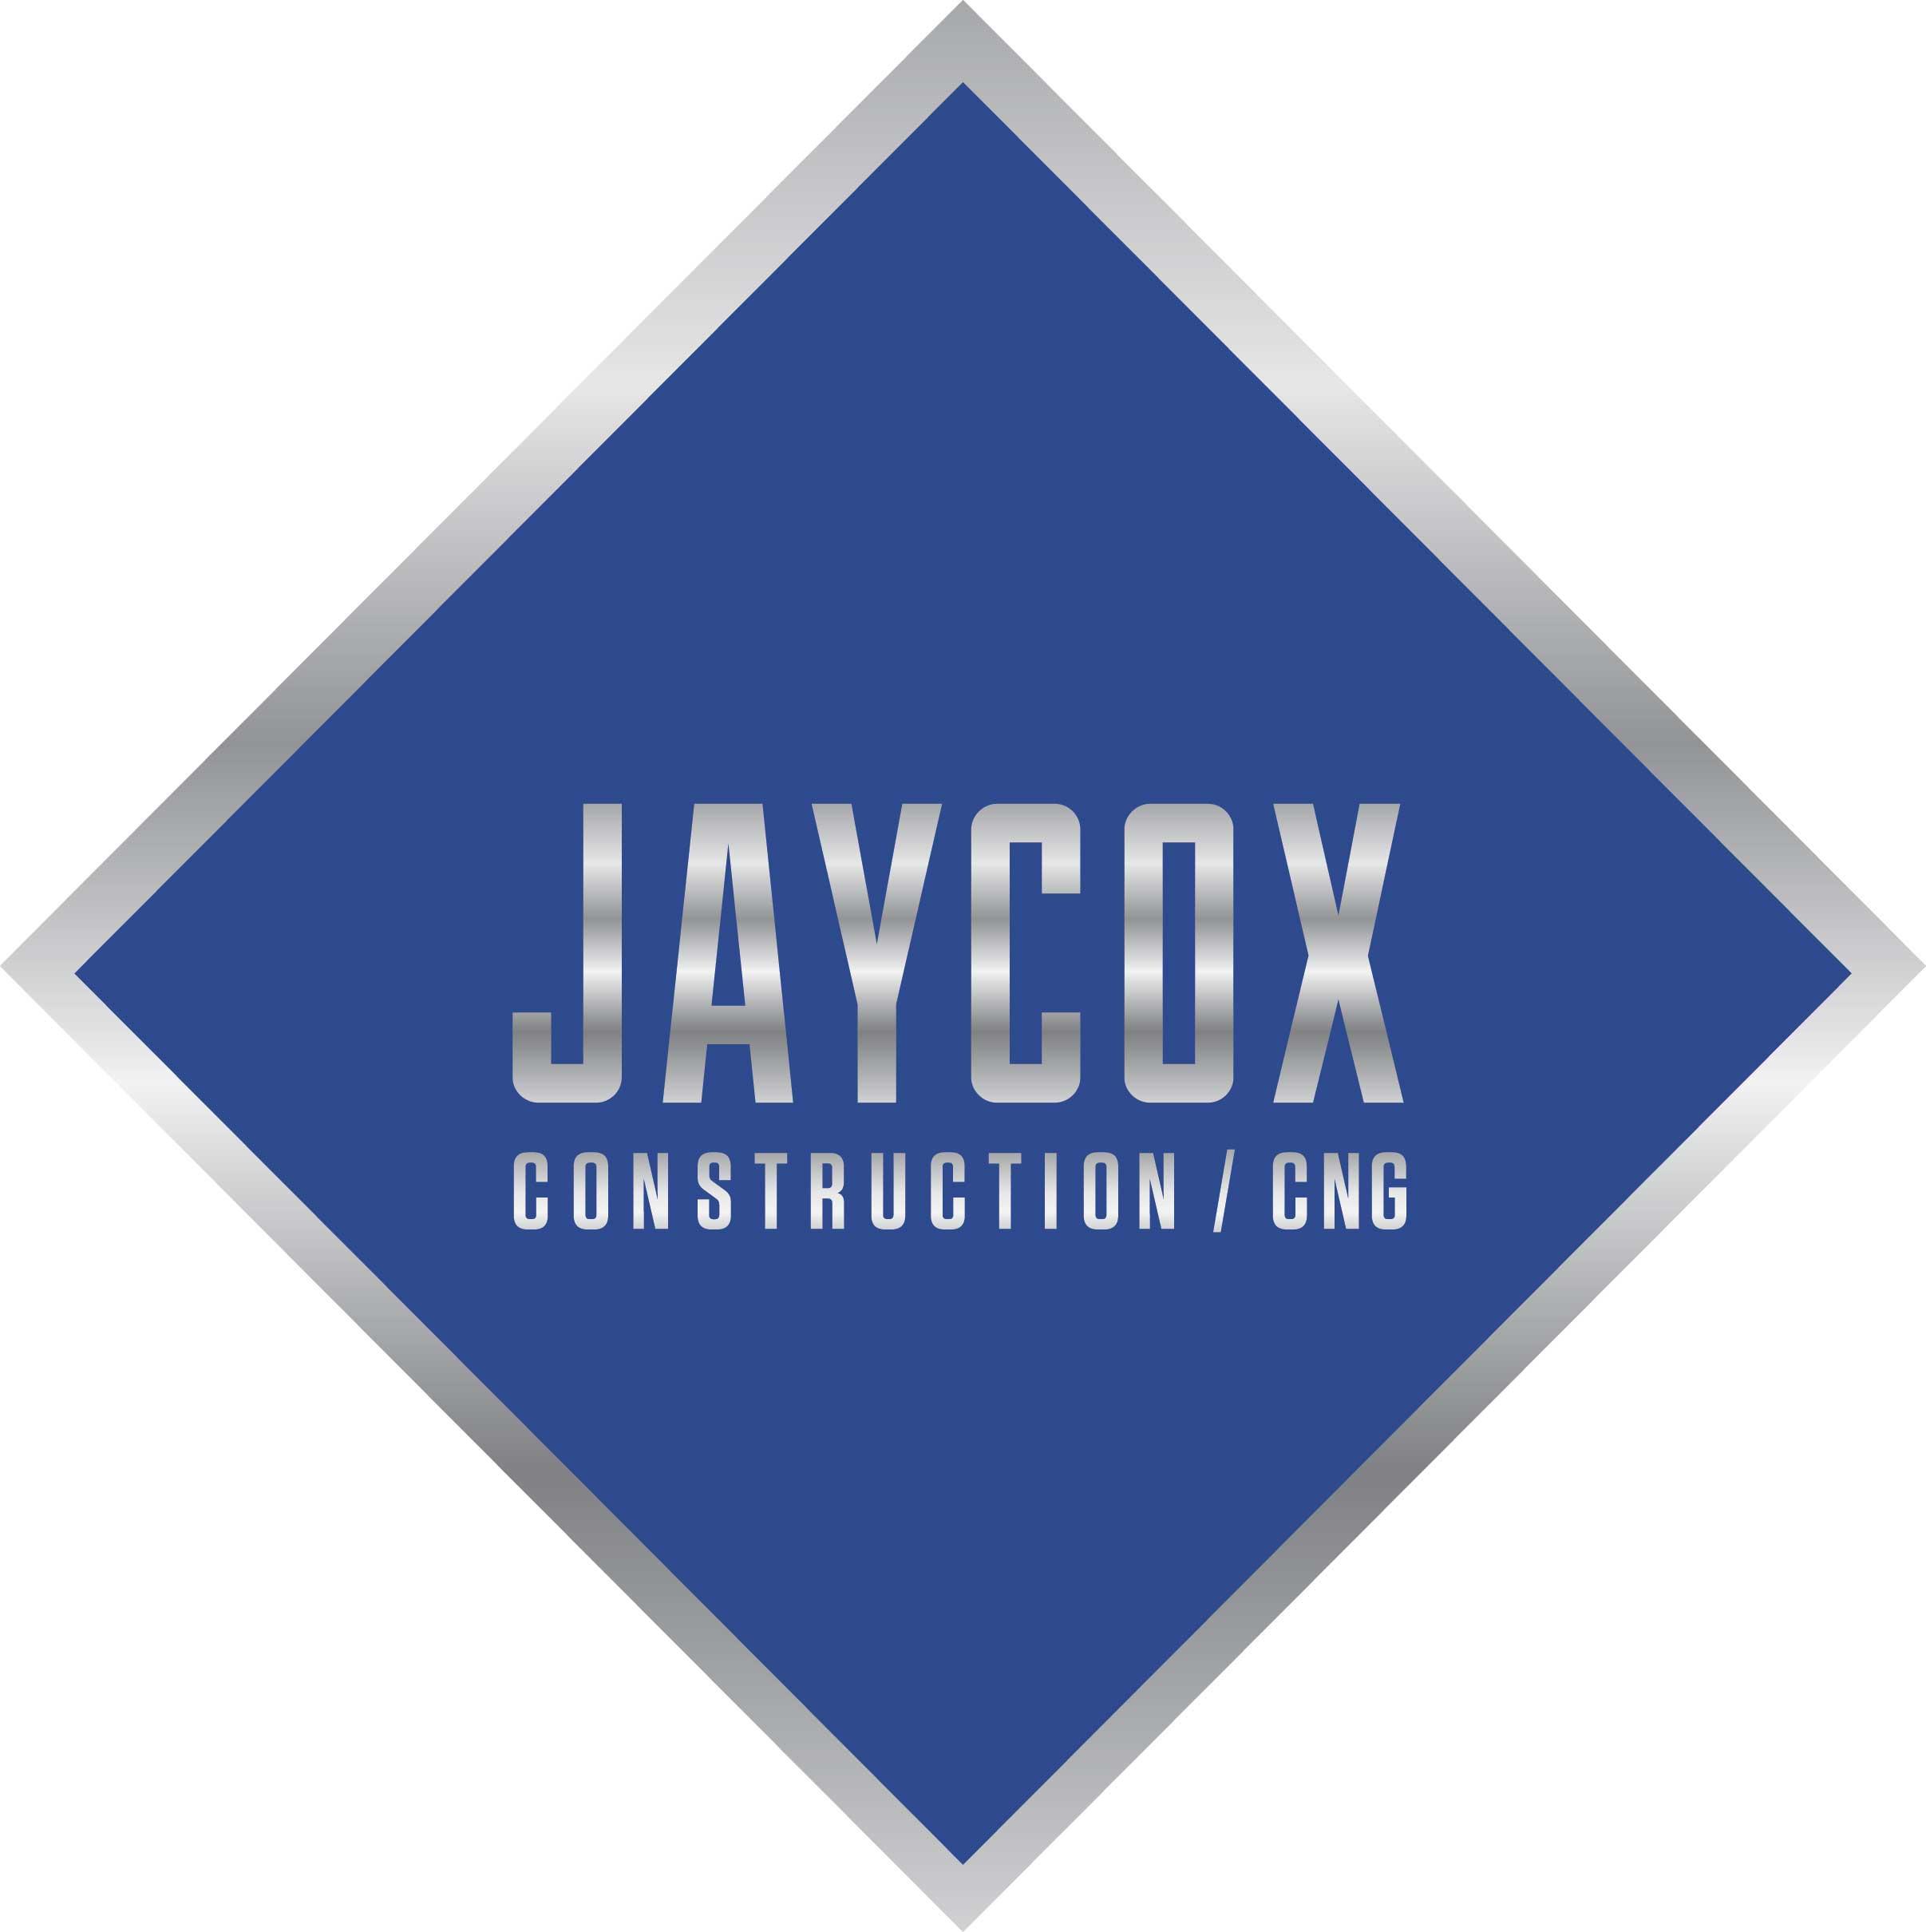 Jaycox_CNG